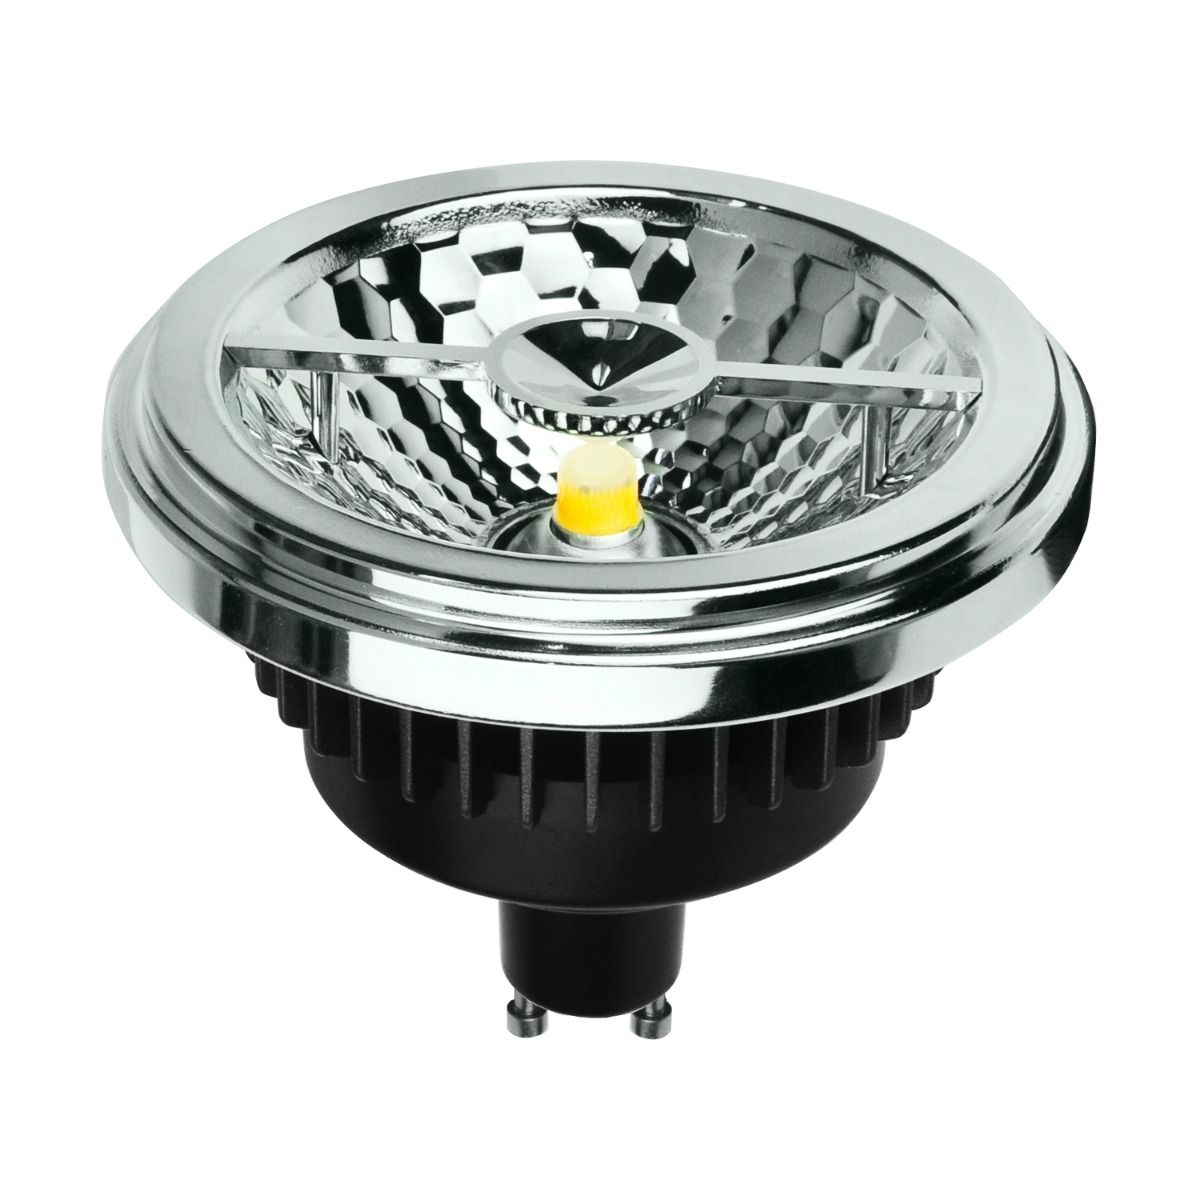 Noxion LEDspot AR111 GU10 Pro V2.0 12-50W 927 40D 600lm DIM